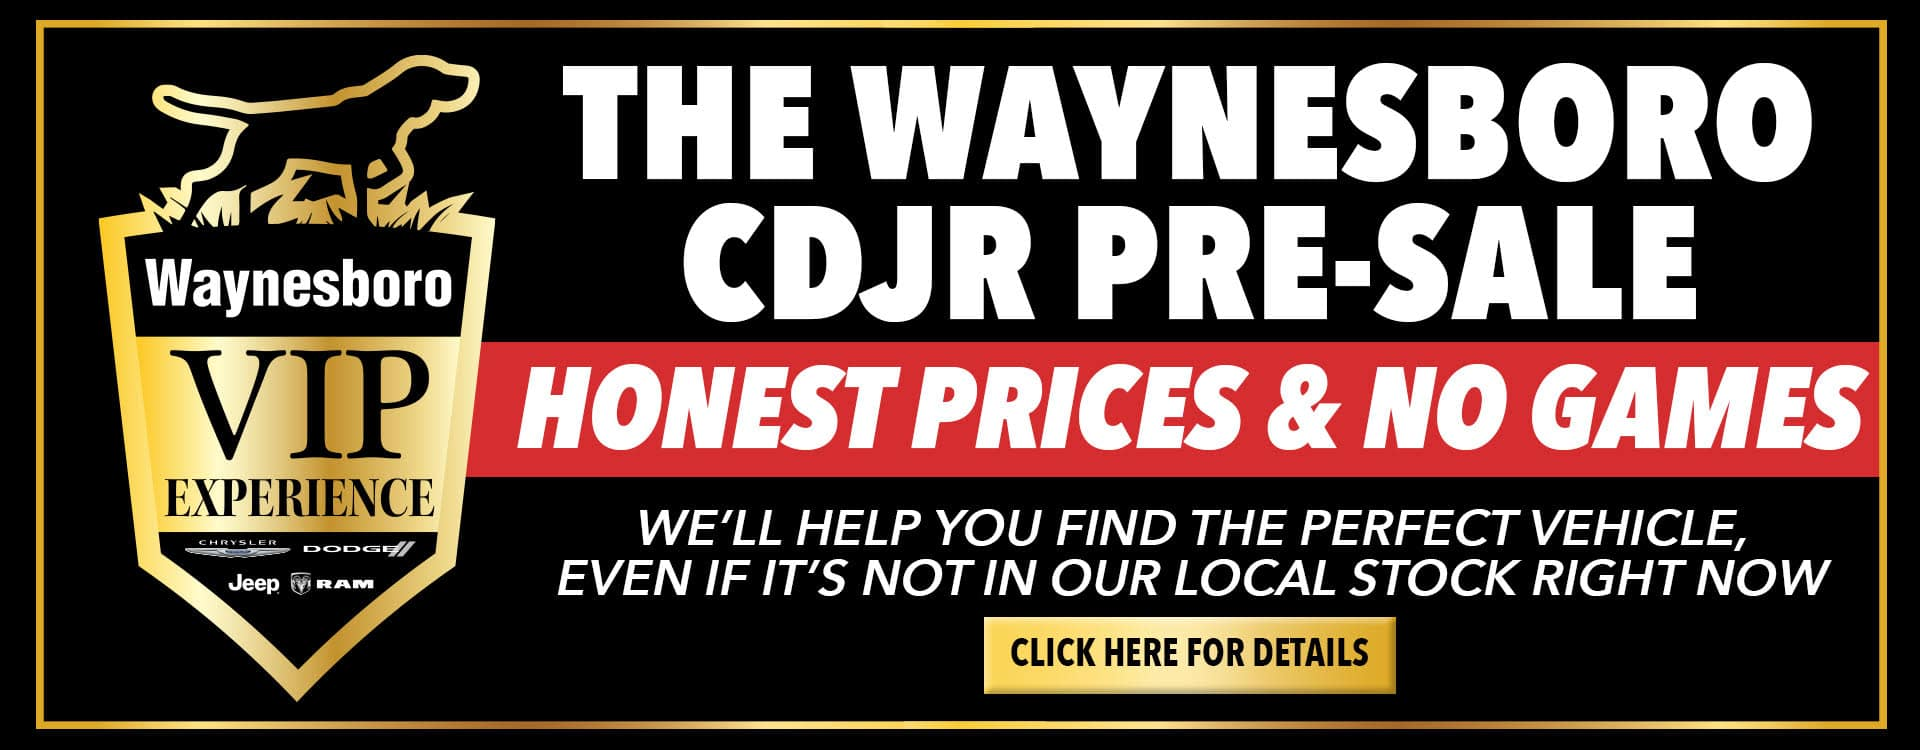 Waynesboro CDJR Pre-Sale Banner May 2021